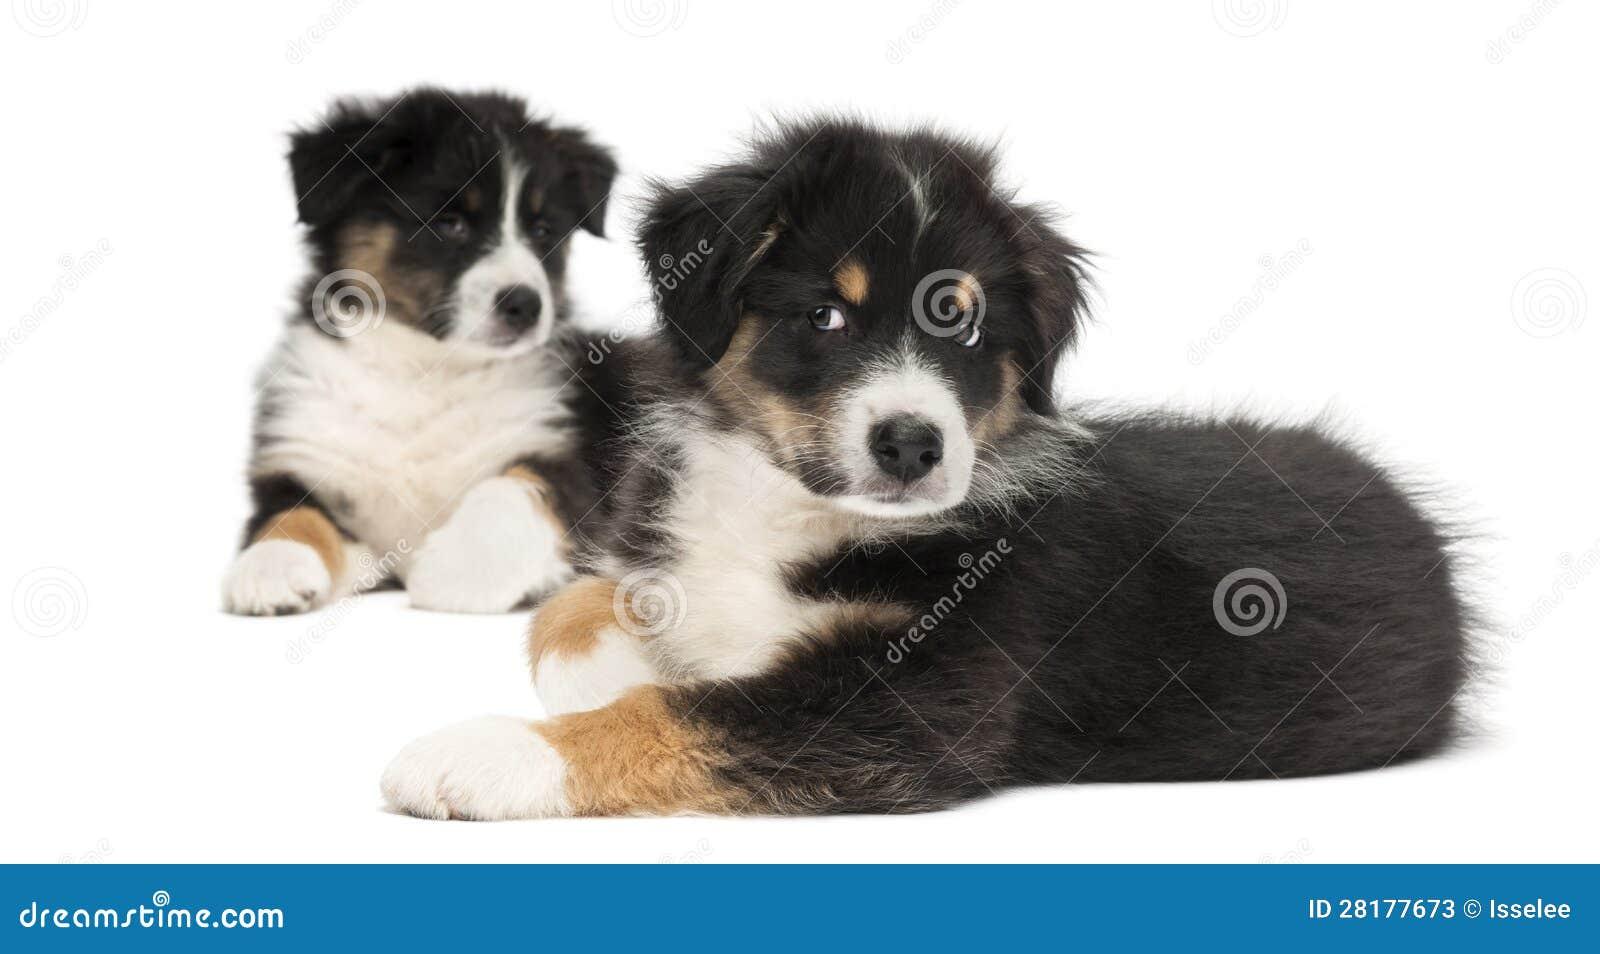 Two Australian Shepherd Puppies, 2 Months Old Stock Photos - Image ...